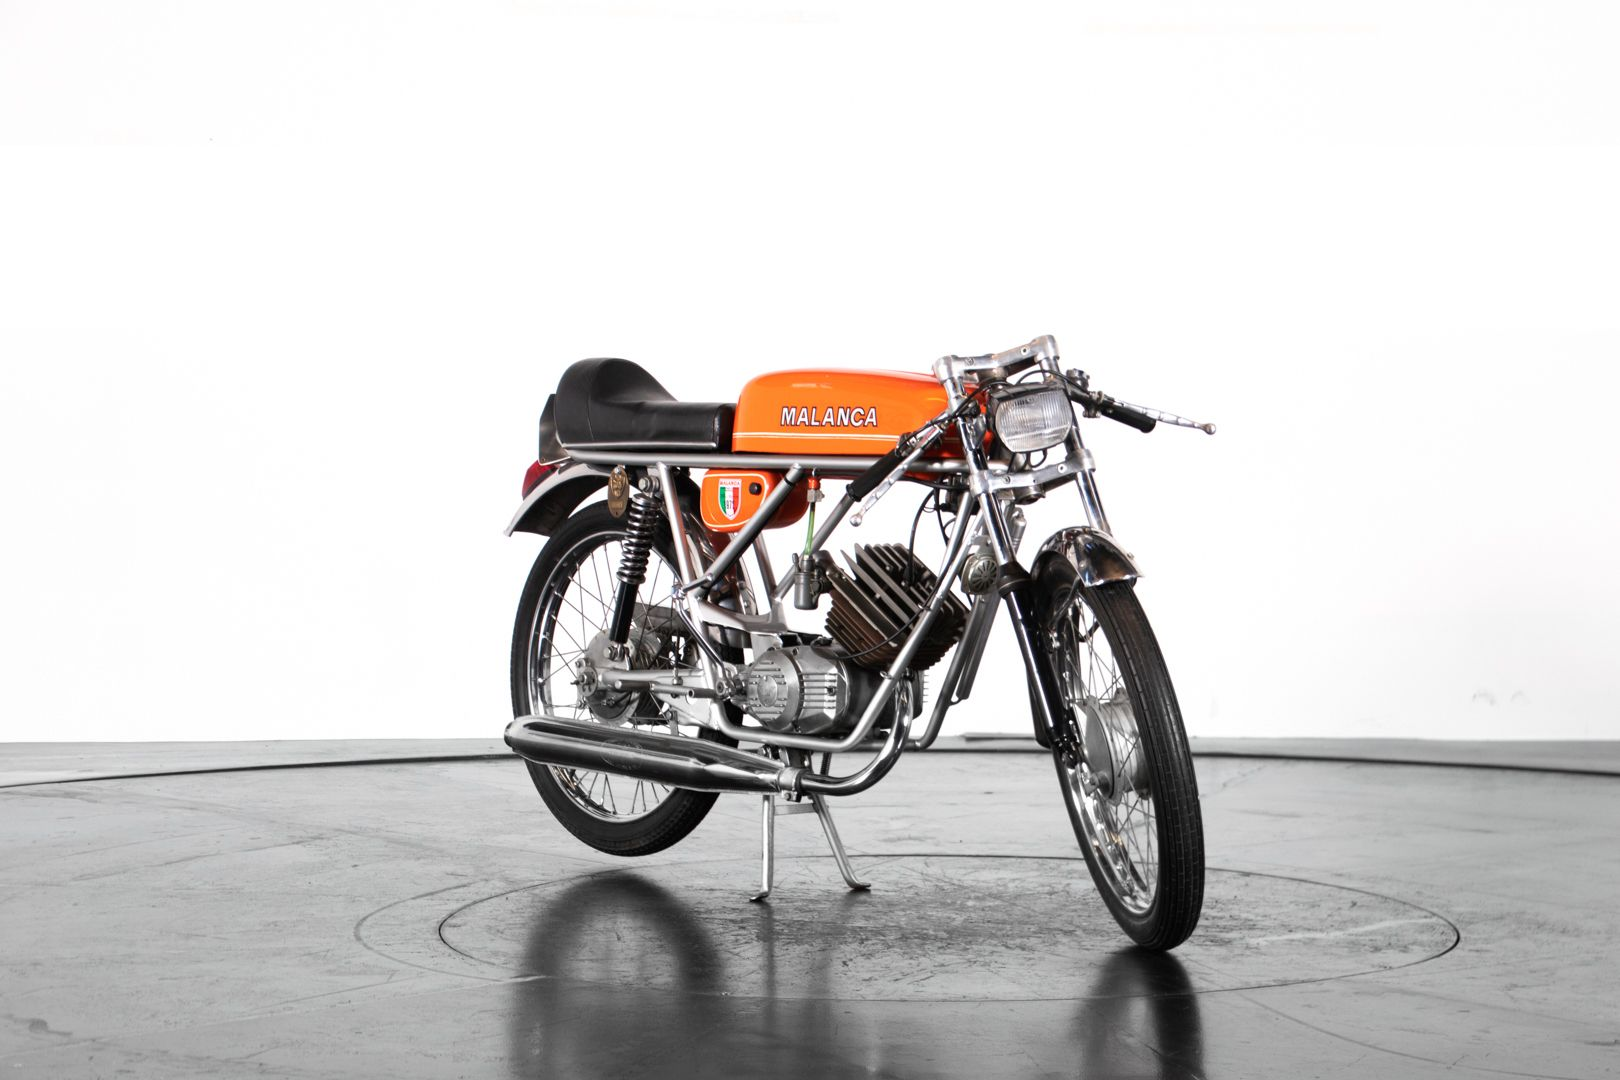 1975 Malanca DTR 49148